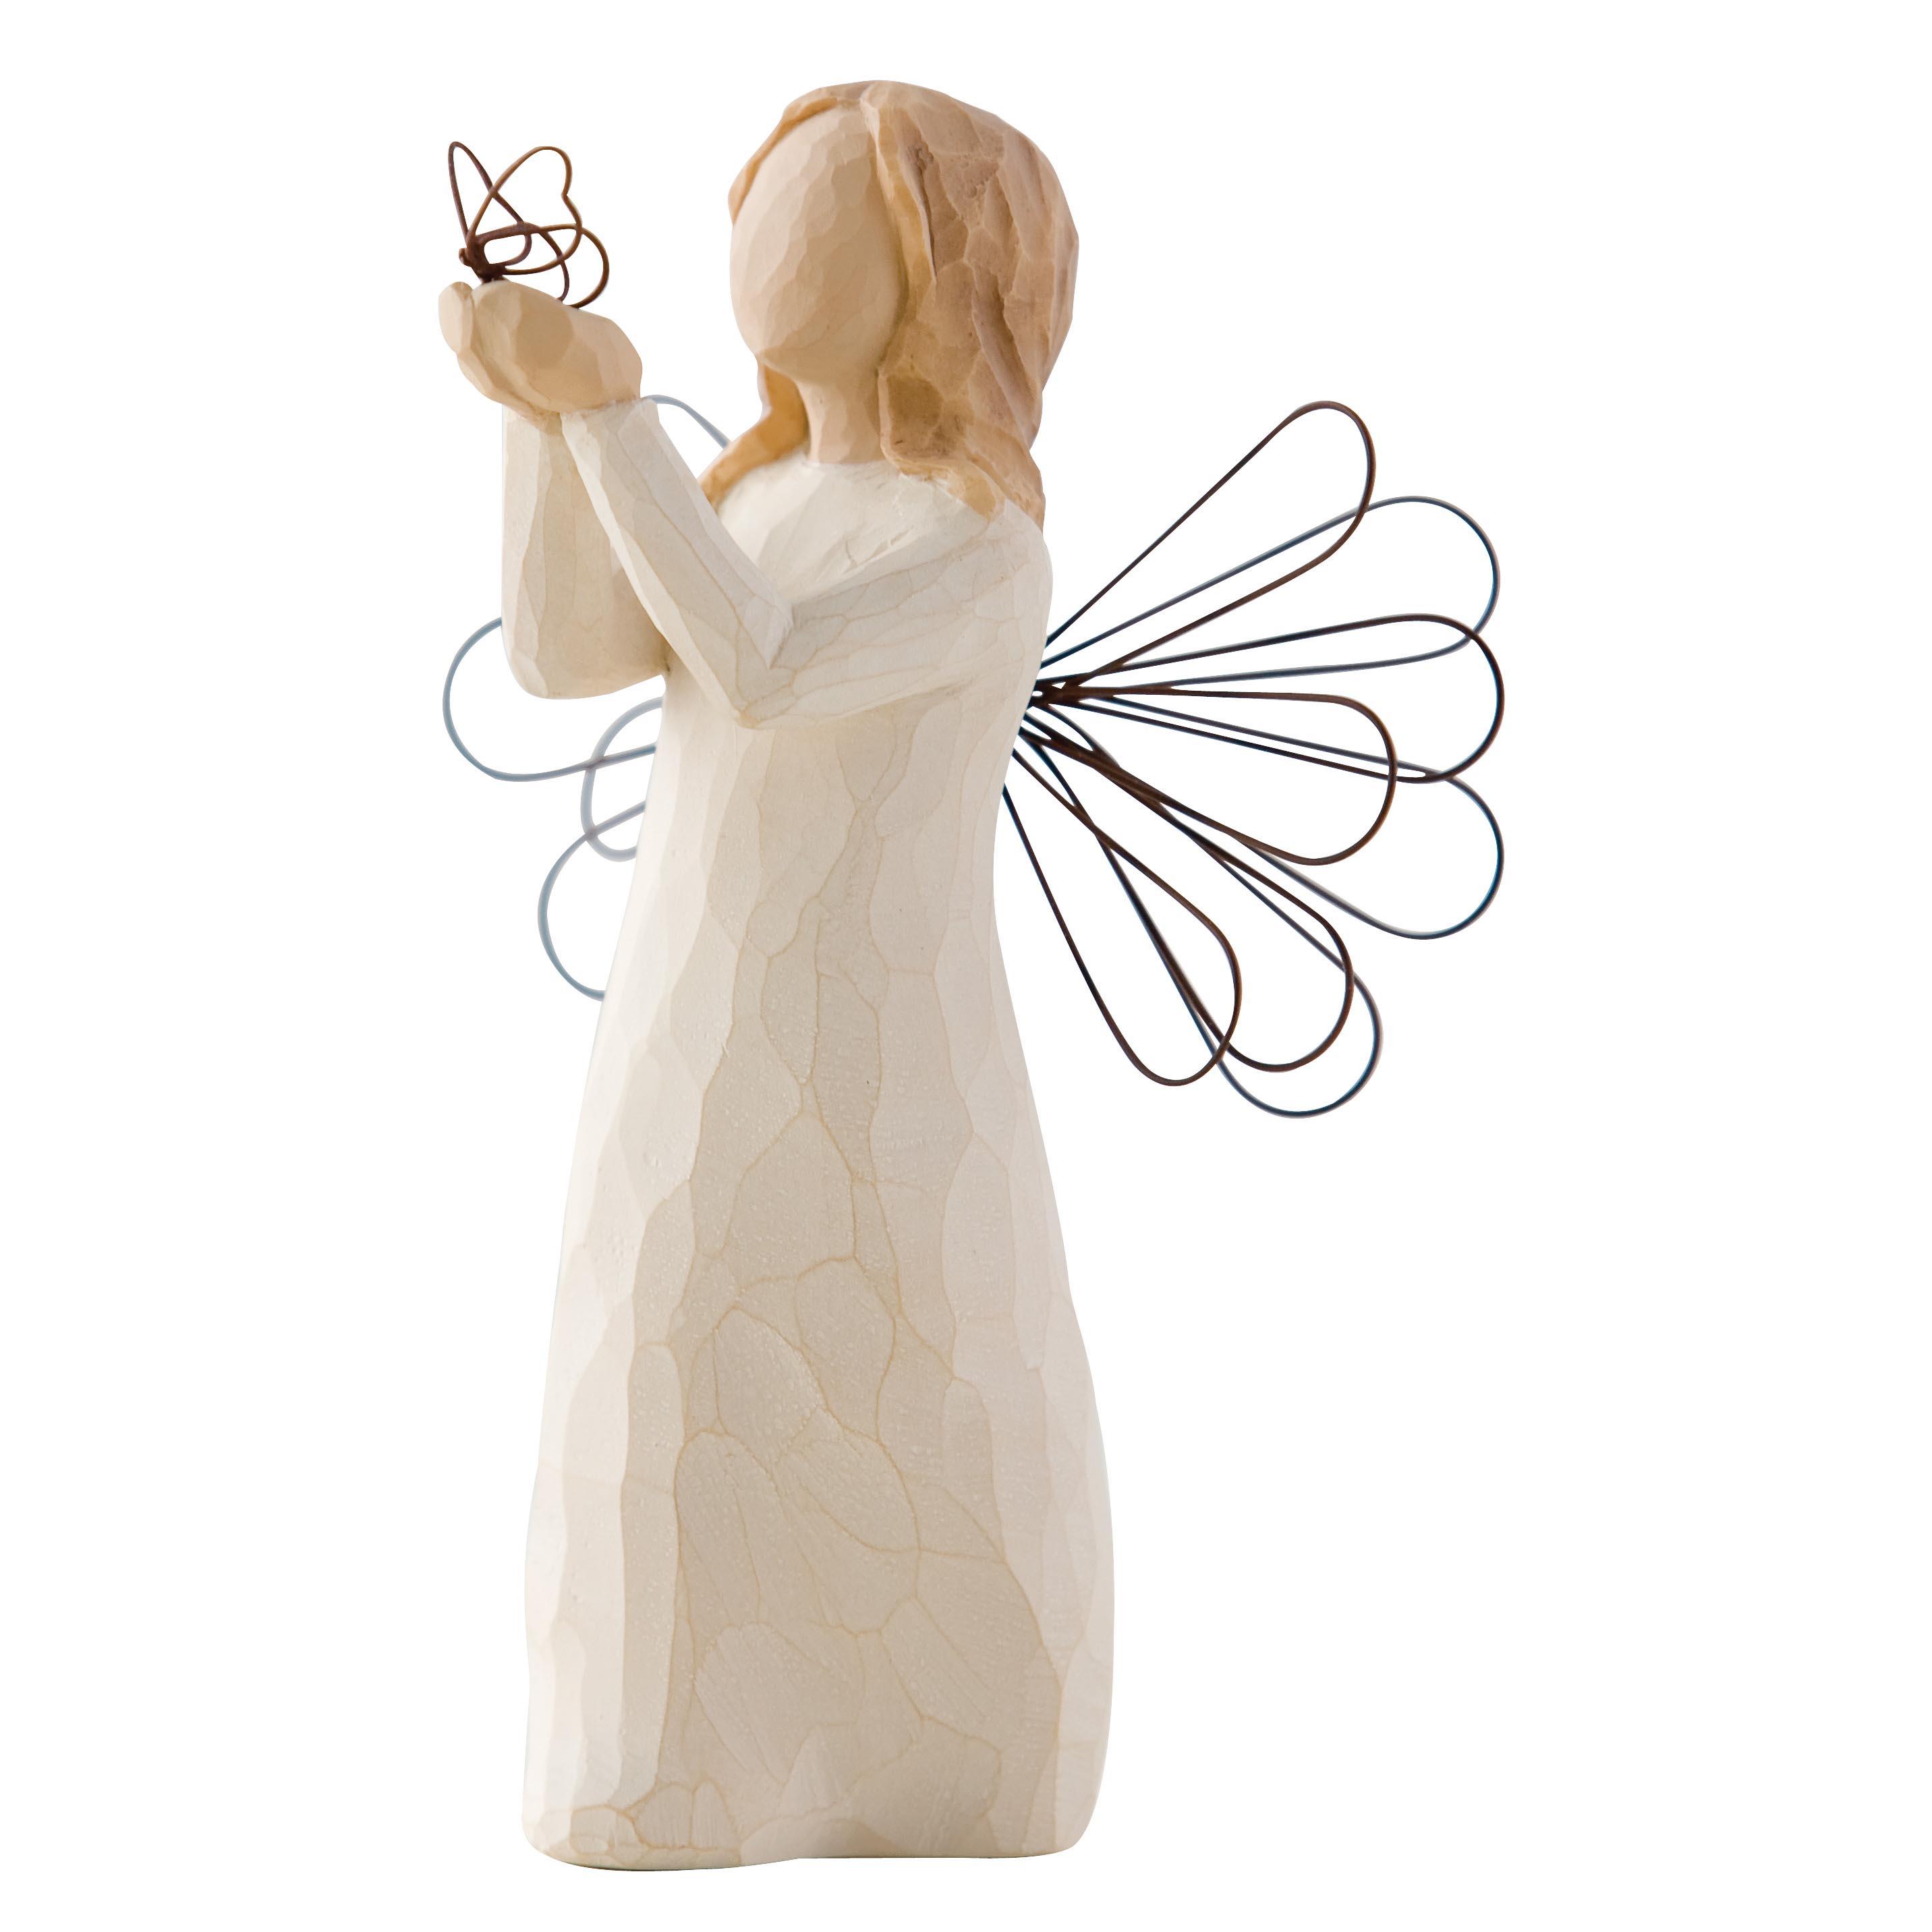 Angel of freedom / Freiheit (26219)